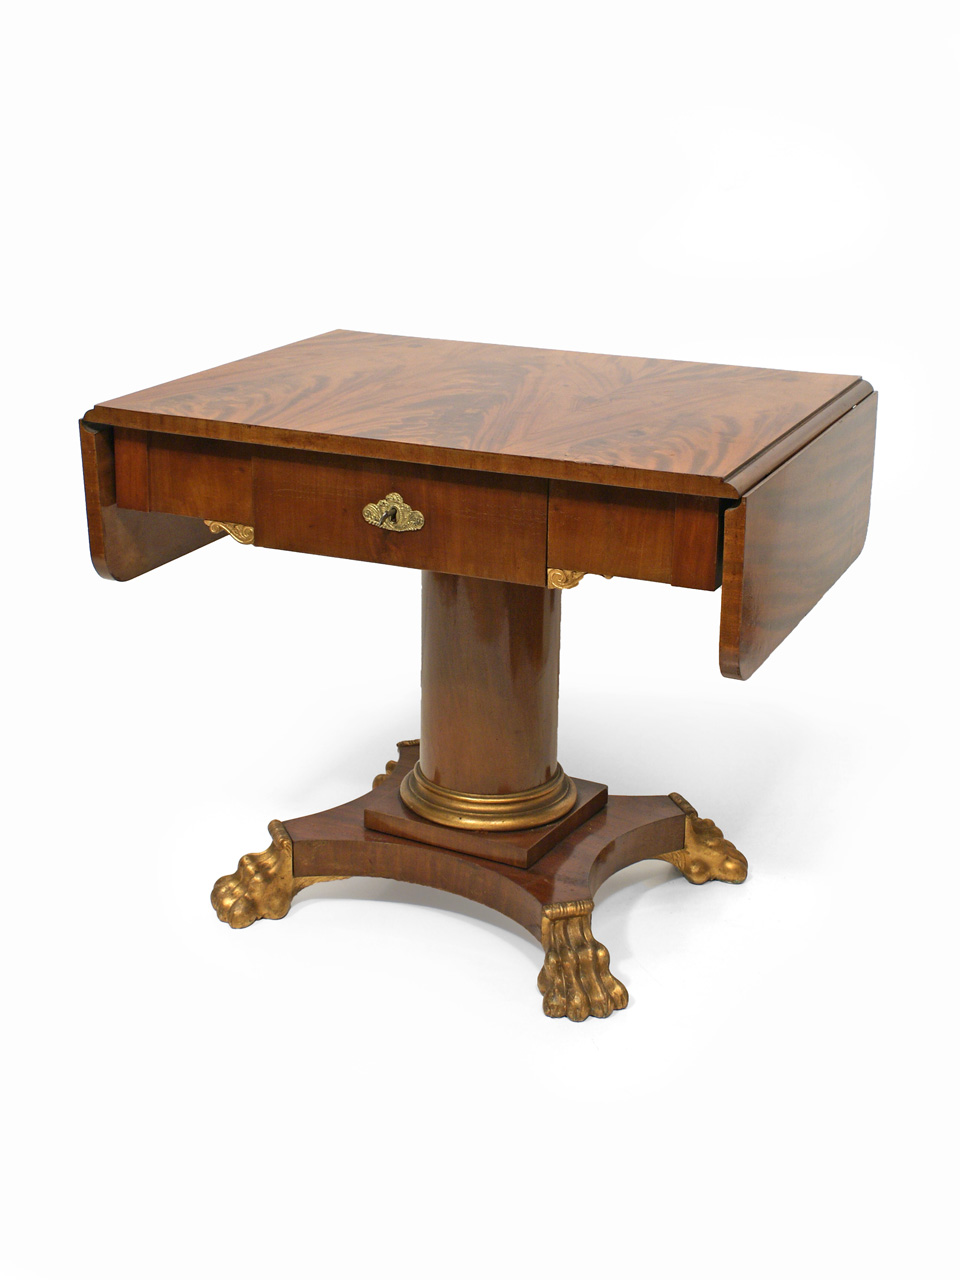 art nr 3013 tisch mahagoni 2 h lfte 19 jh antiquit ten am markt t bingen. Black Bedroom Furniture Sets. Home Design Ideas